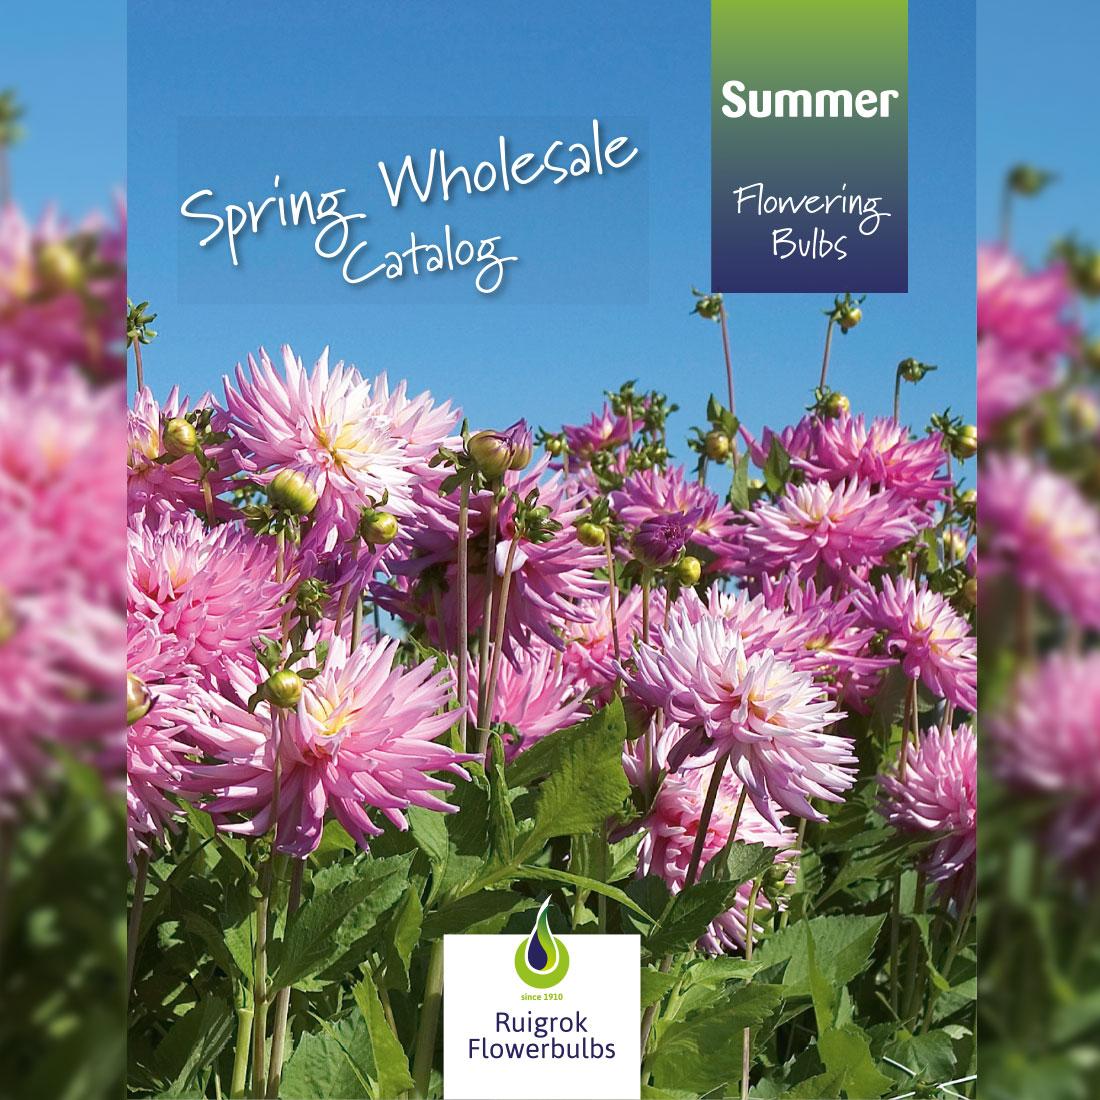 Spring Catalogus Ruigrok Flowerbulbs